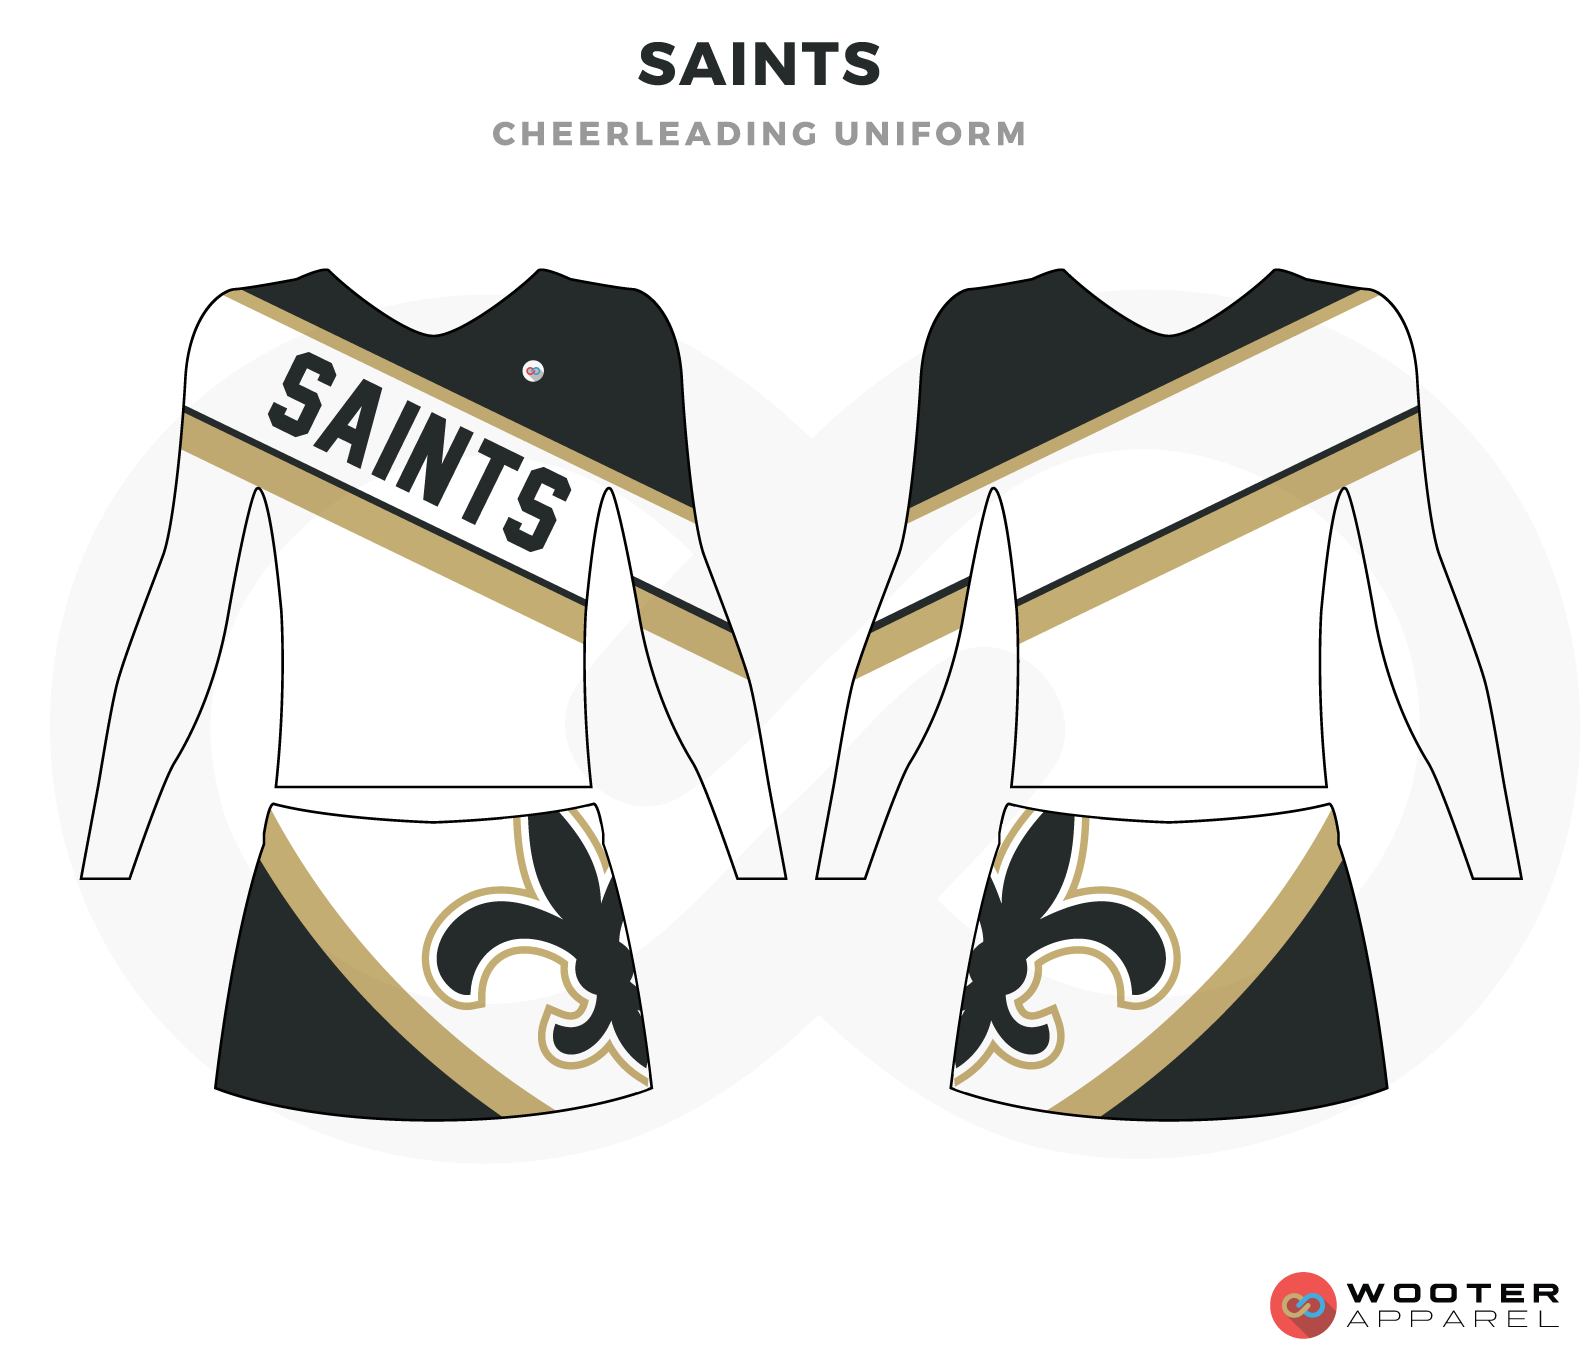 SAINTS white black beige cheerleading uniforms, top, and skirt